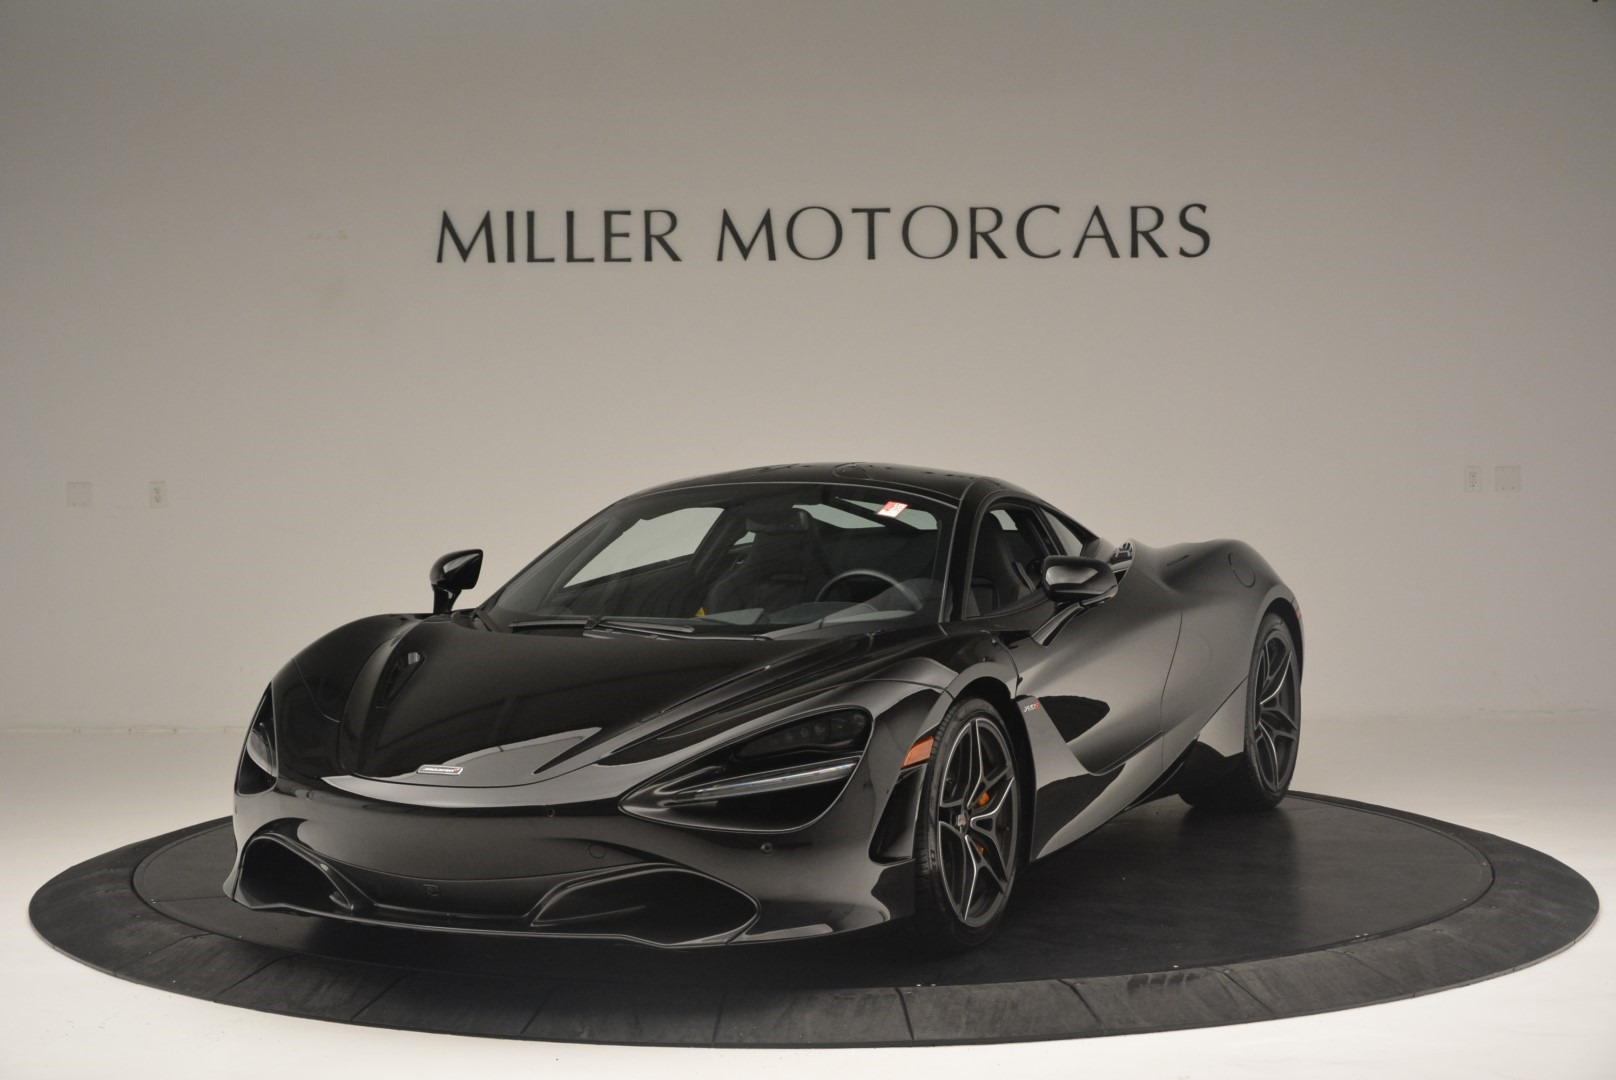 Used 2018 McLaren 720S Coupe for sale Sold at Alfa Romeo of Westport in Westport CT 06880 1